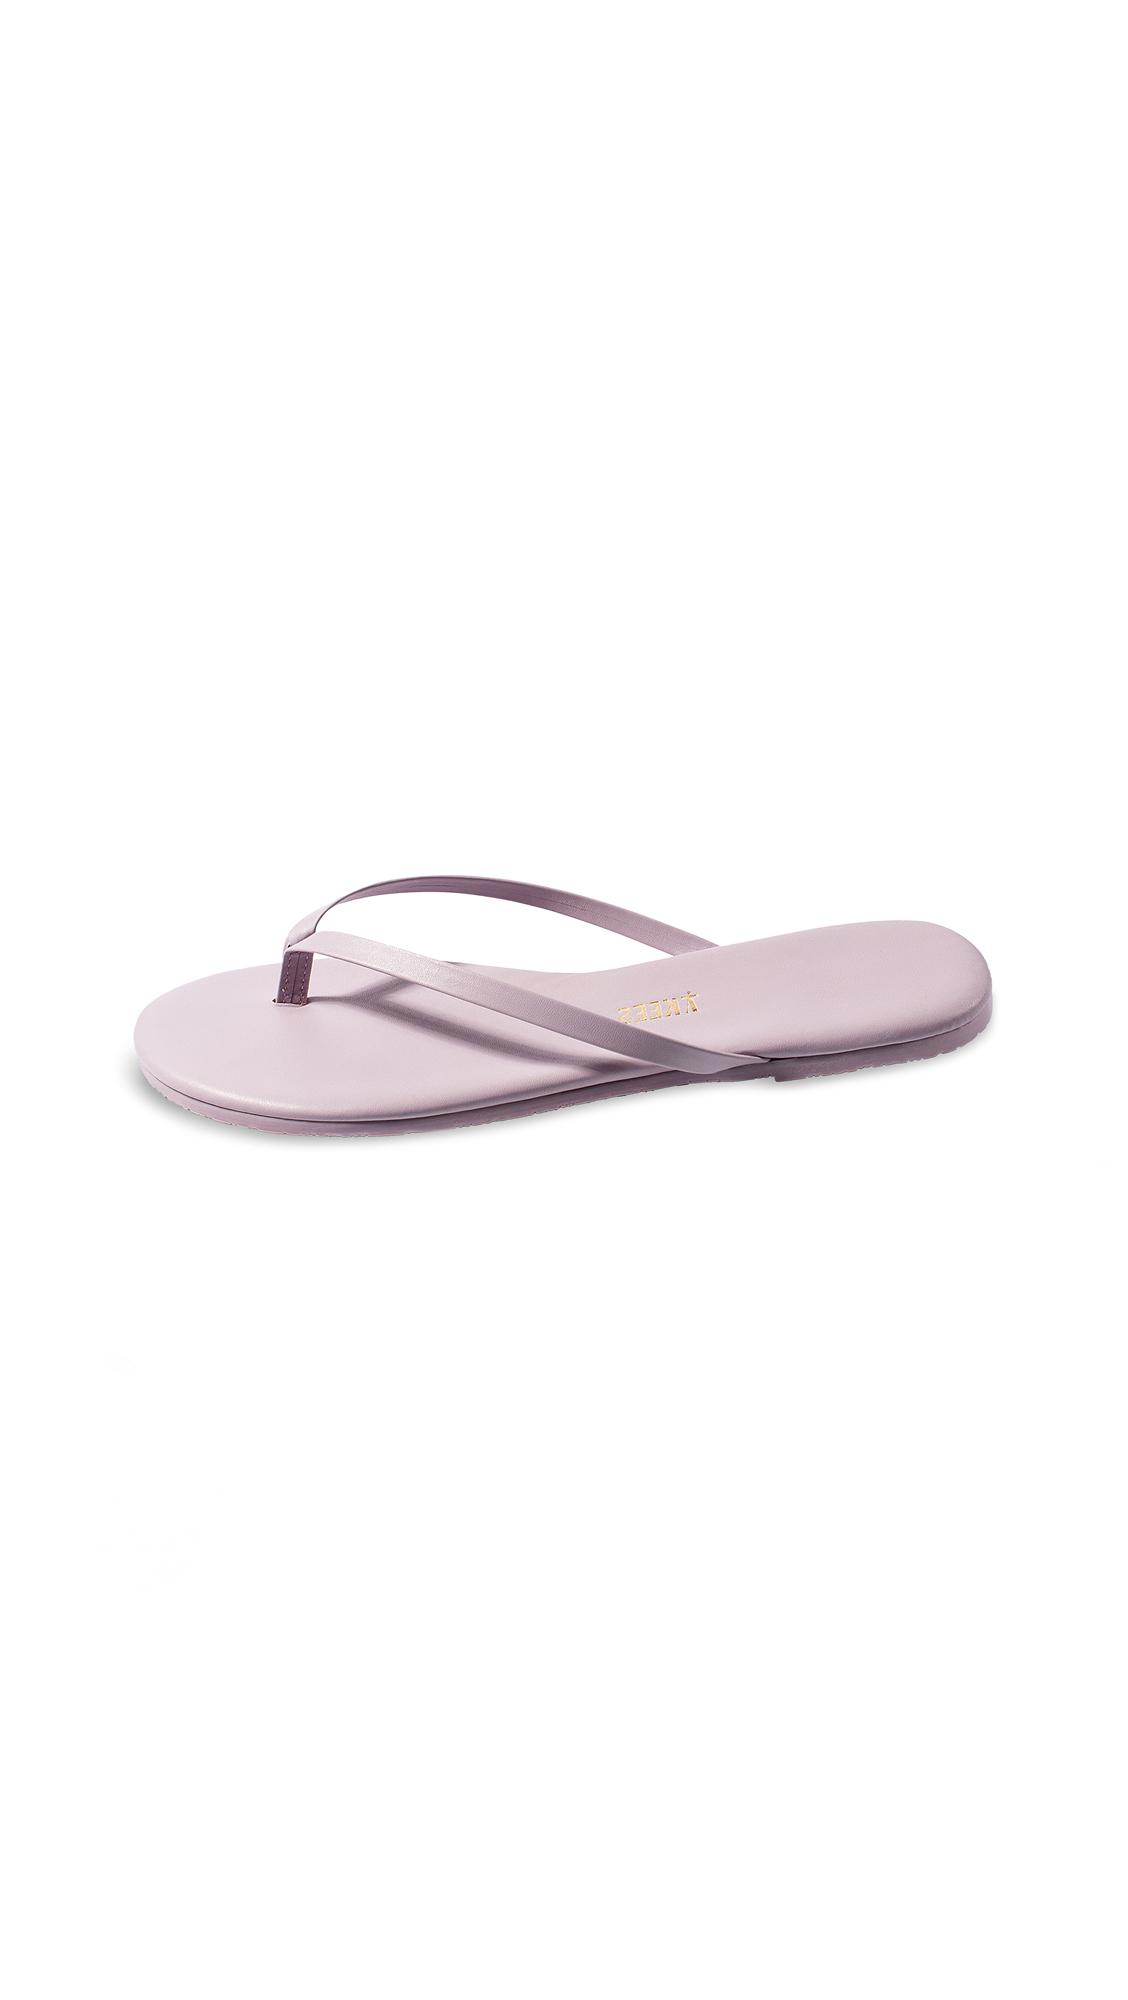 TKEES Solid Flip Flops